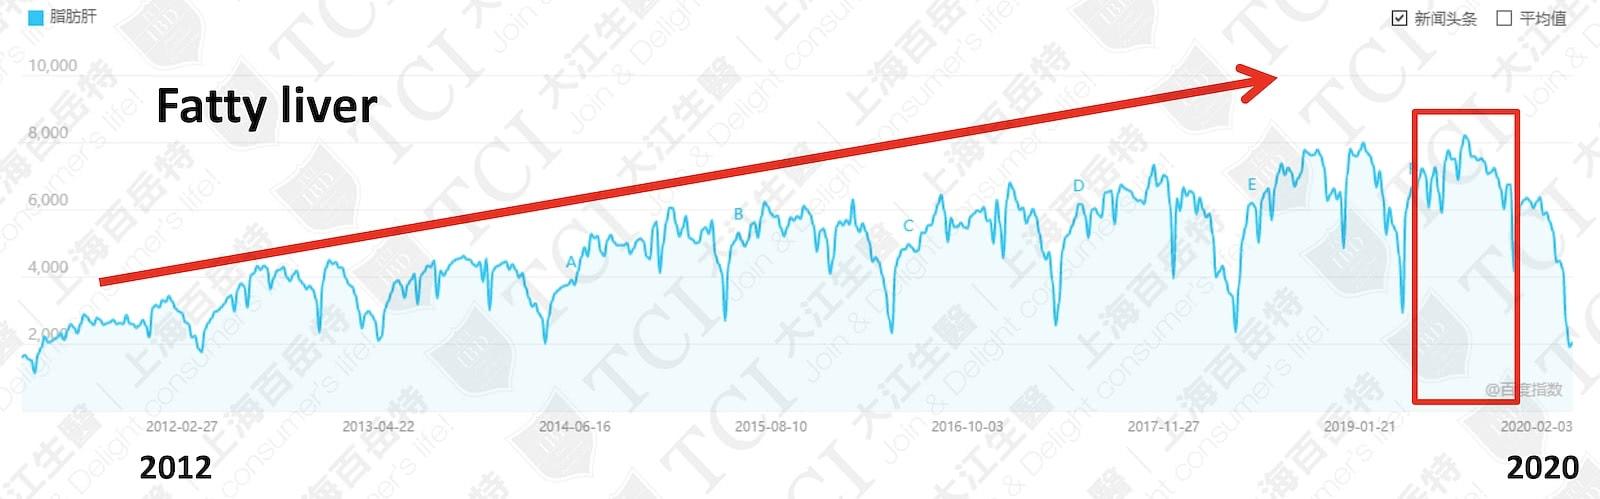 Search Volume of Fatty Liver / Data Source: Baidu Index